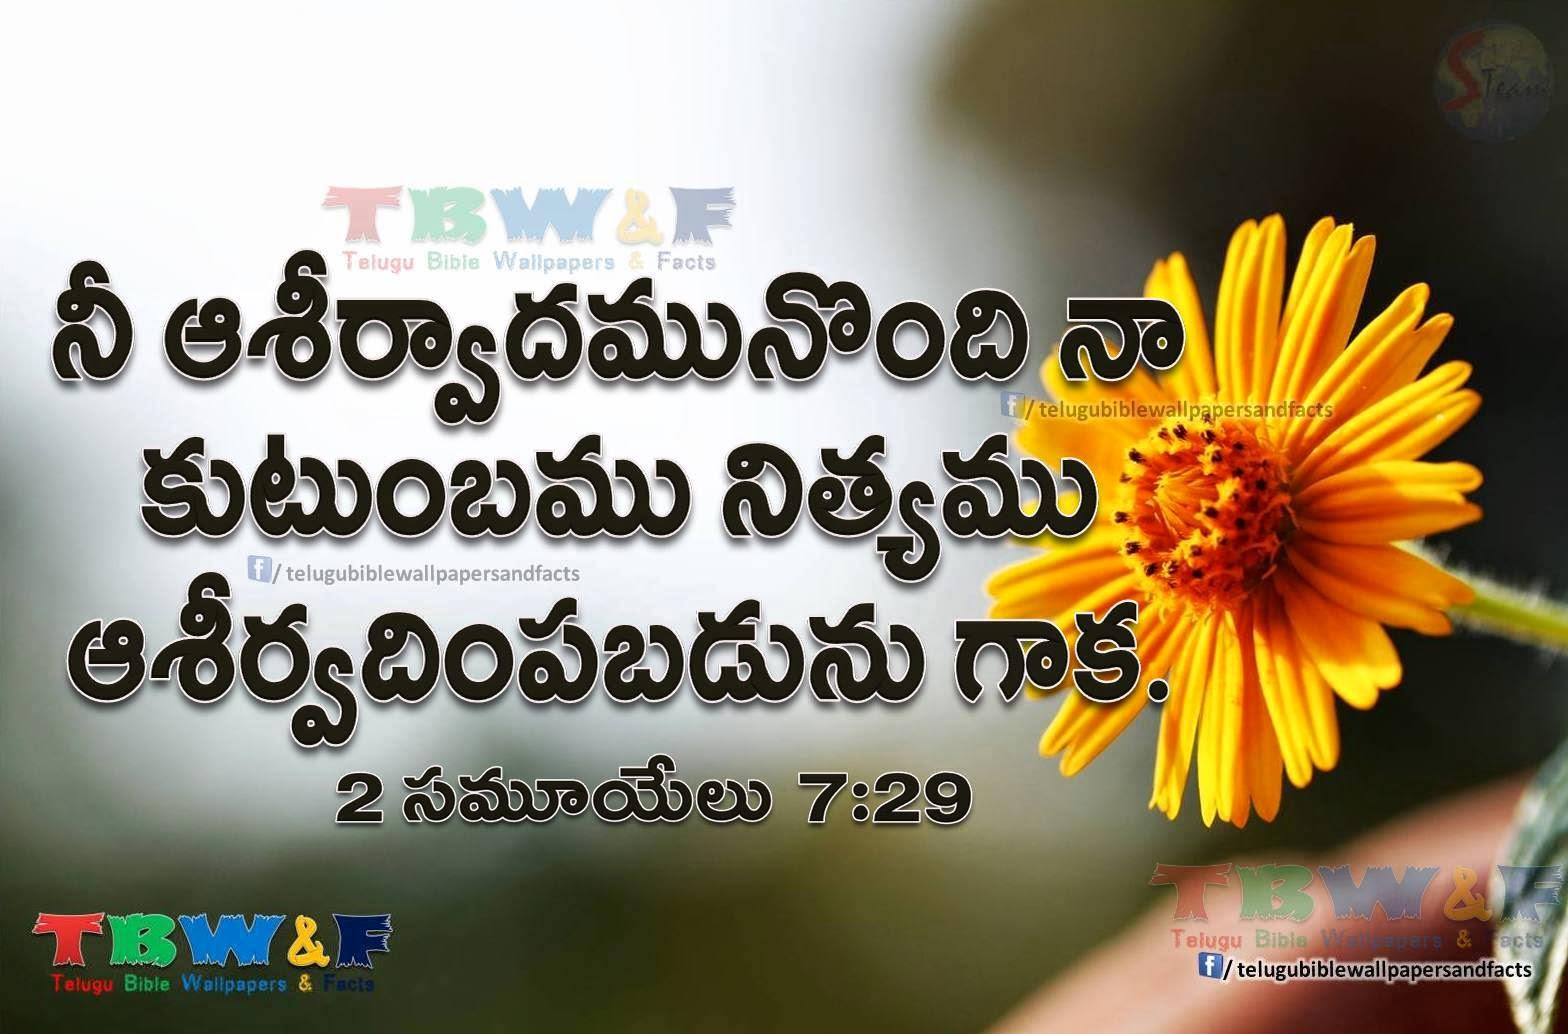 The Christian Messenger Telugu Christian Wallpapers